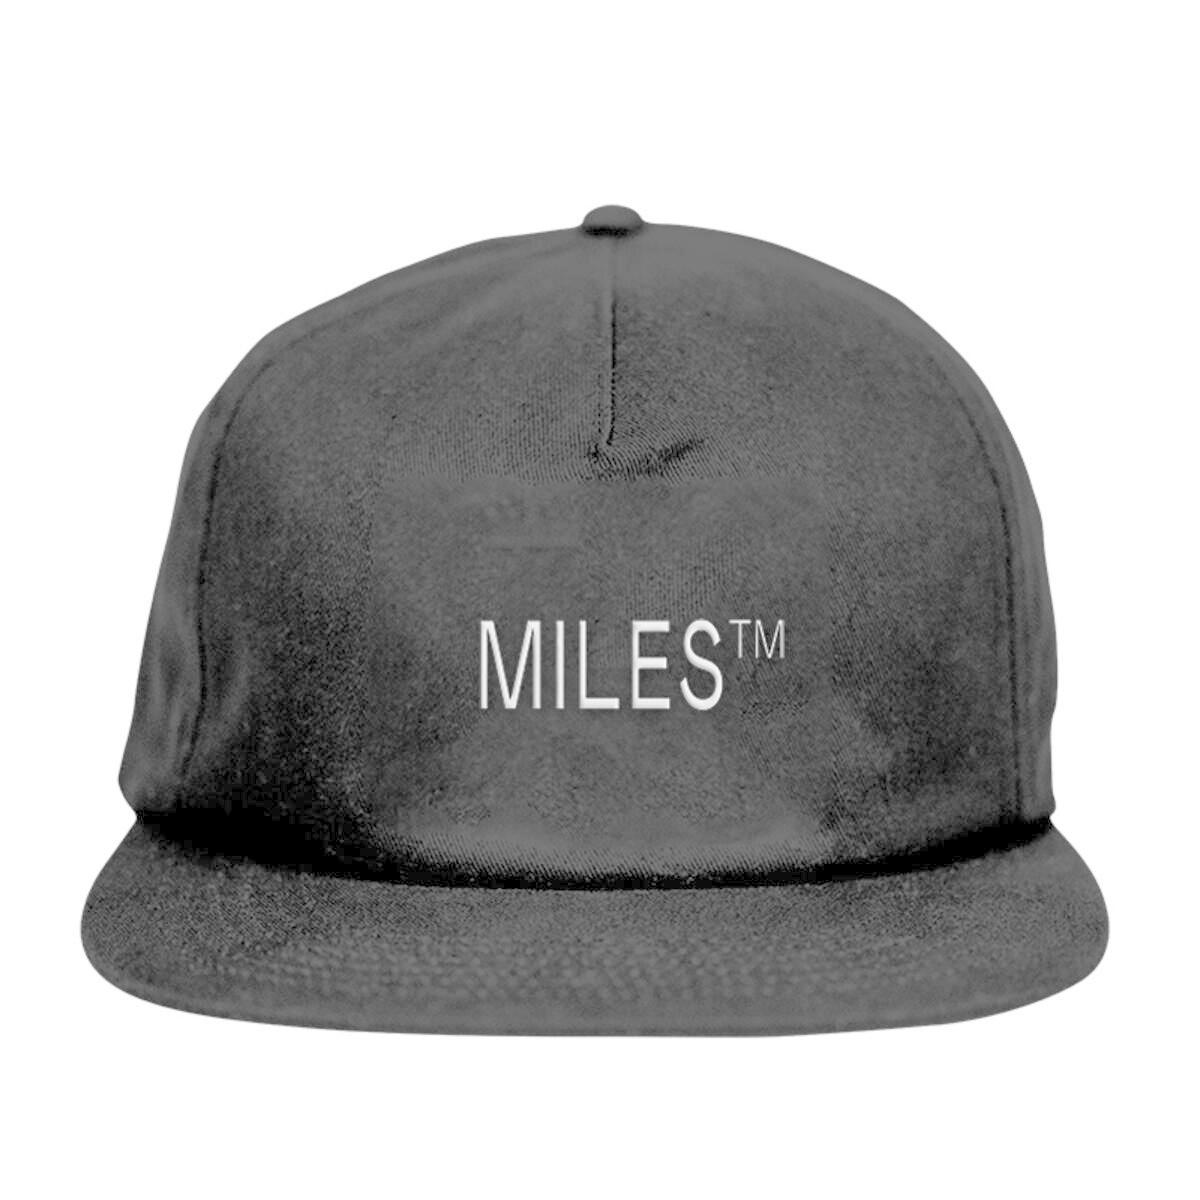 Miles Griptape Miles Logo Hat Black